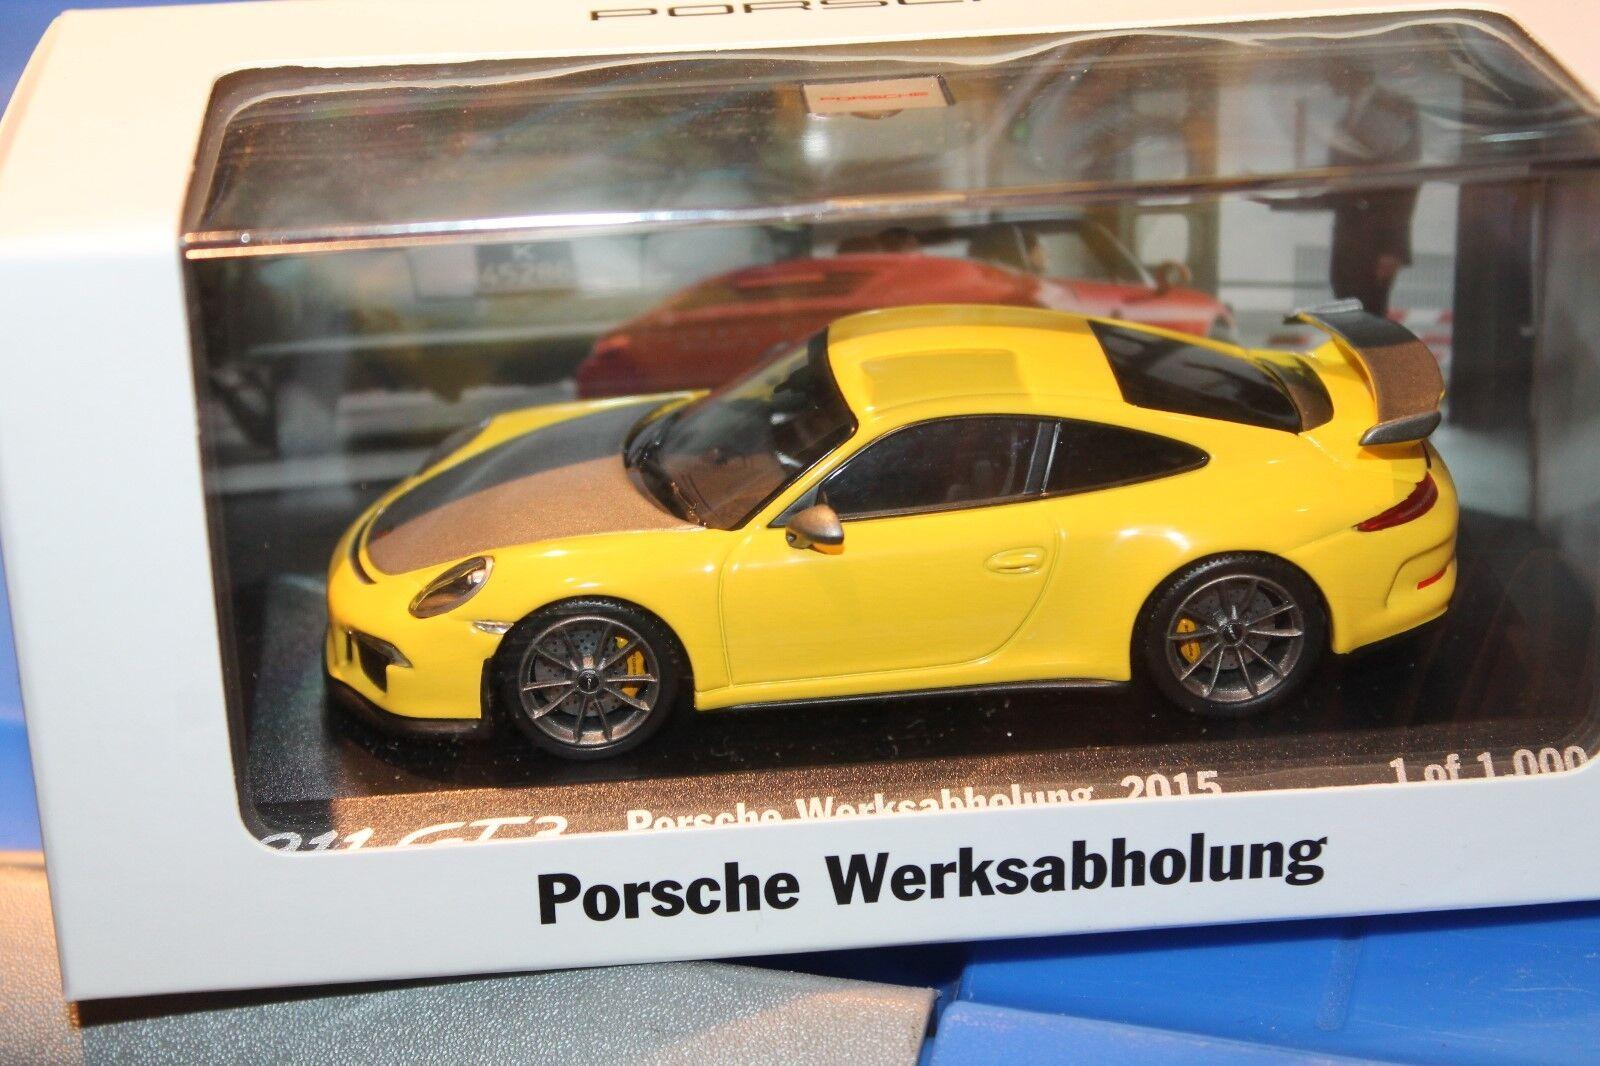 Minichamps  PORSCHE 911 gt3  2015  fabbrica ritiro  1 43  OVP  NUOVO